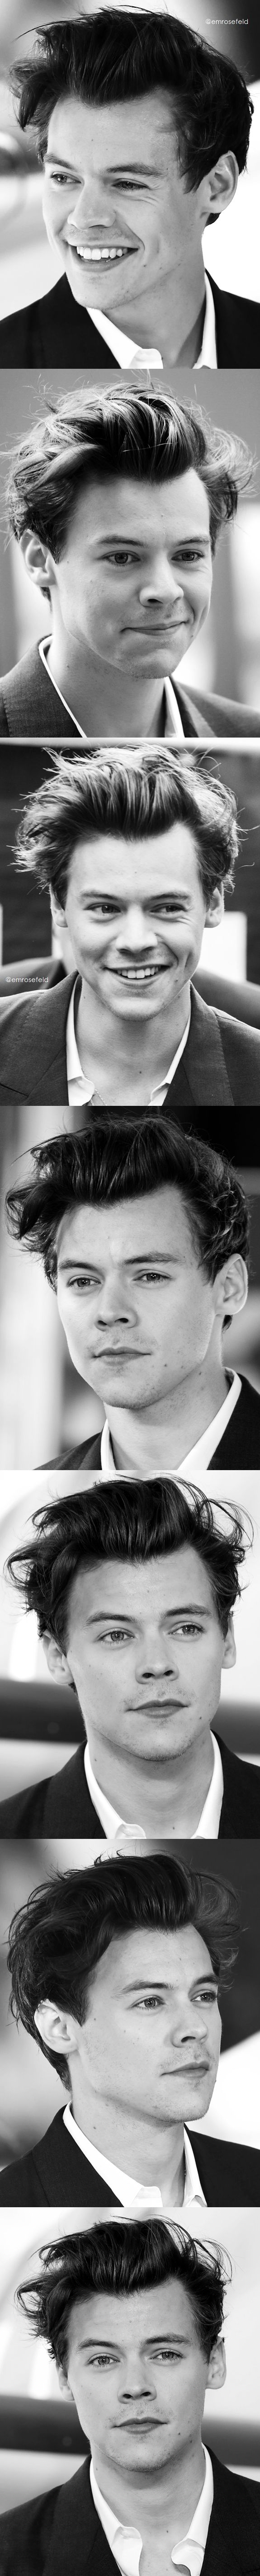 Harry Styles | Dunkirk world premiere 7.13.17 | emrosefeld |